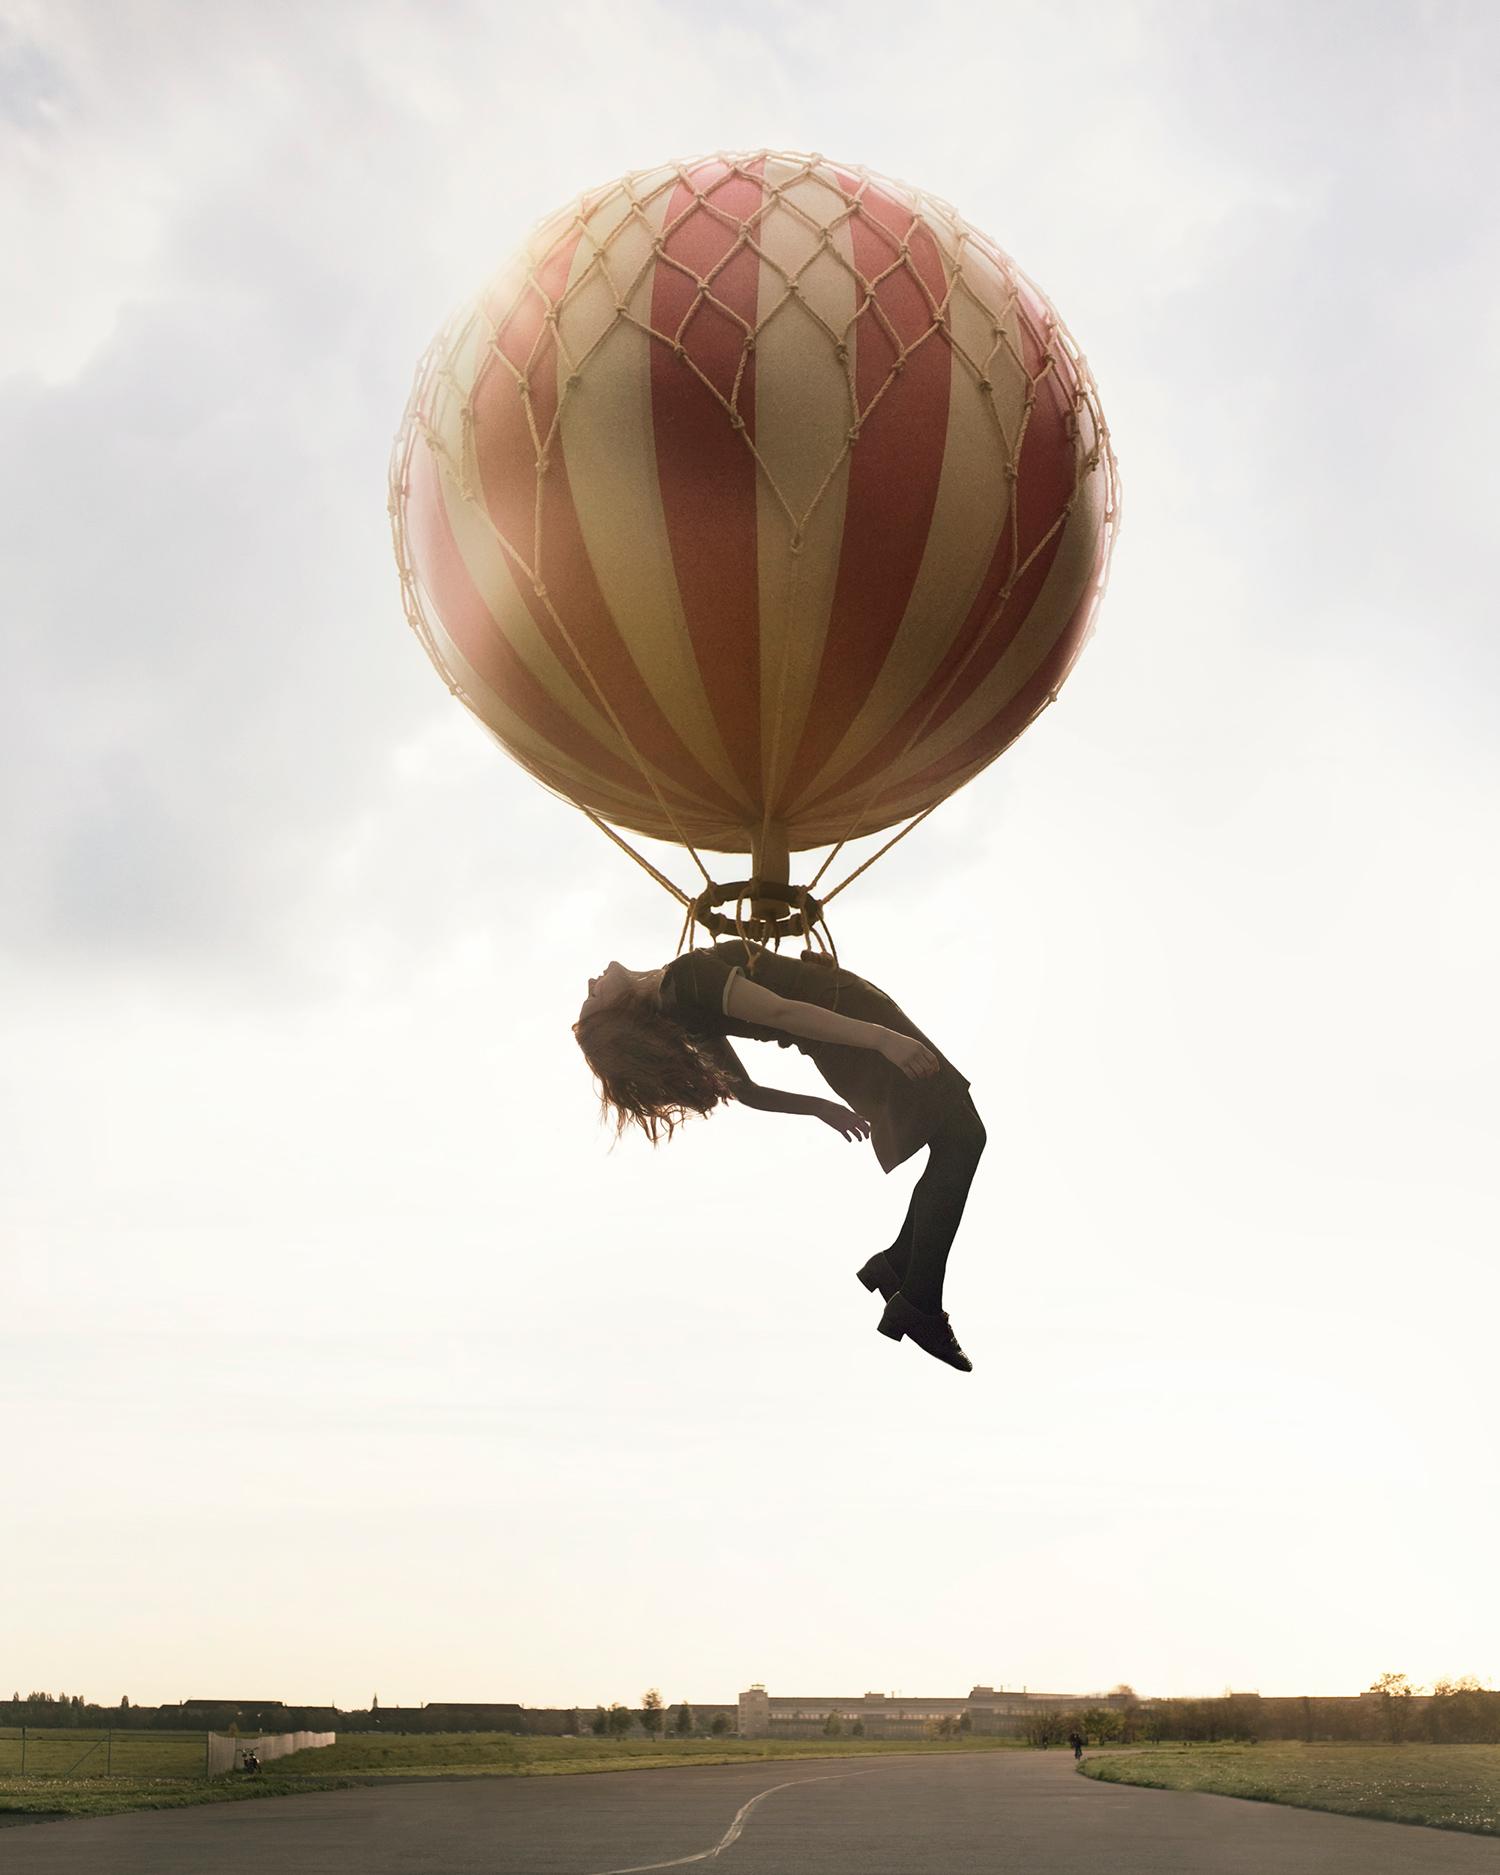 Maia Flore, Sleep Elevations - balloon